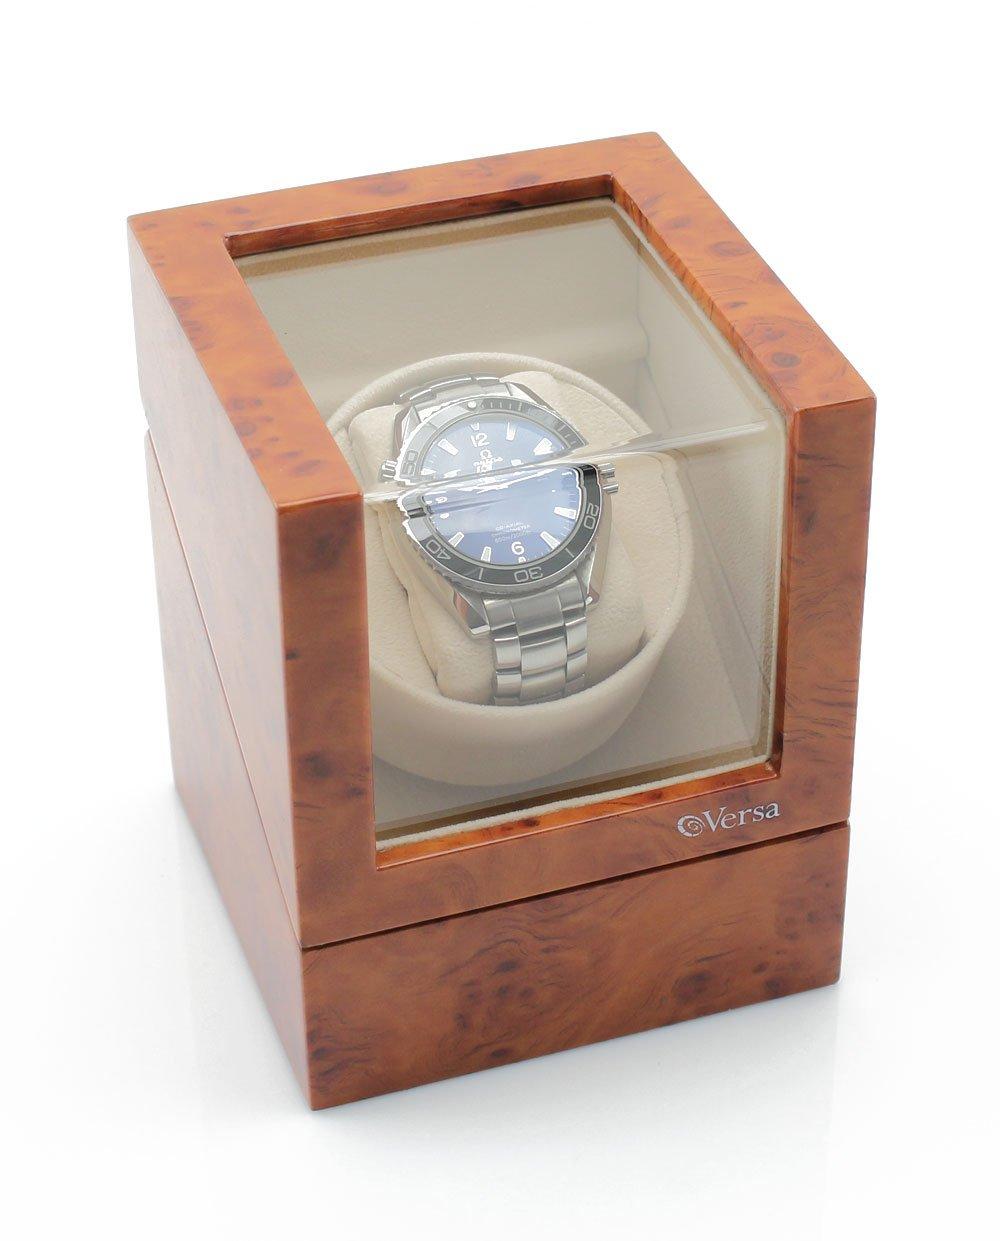 Versa Elite Single Watch Winder in Burlwood